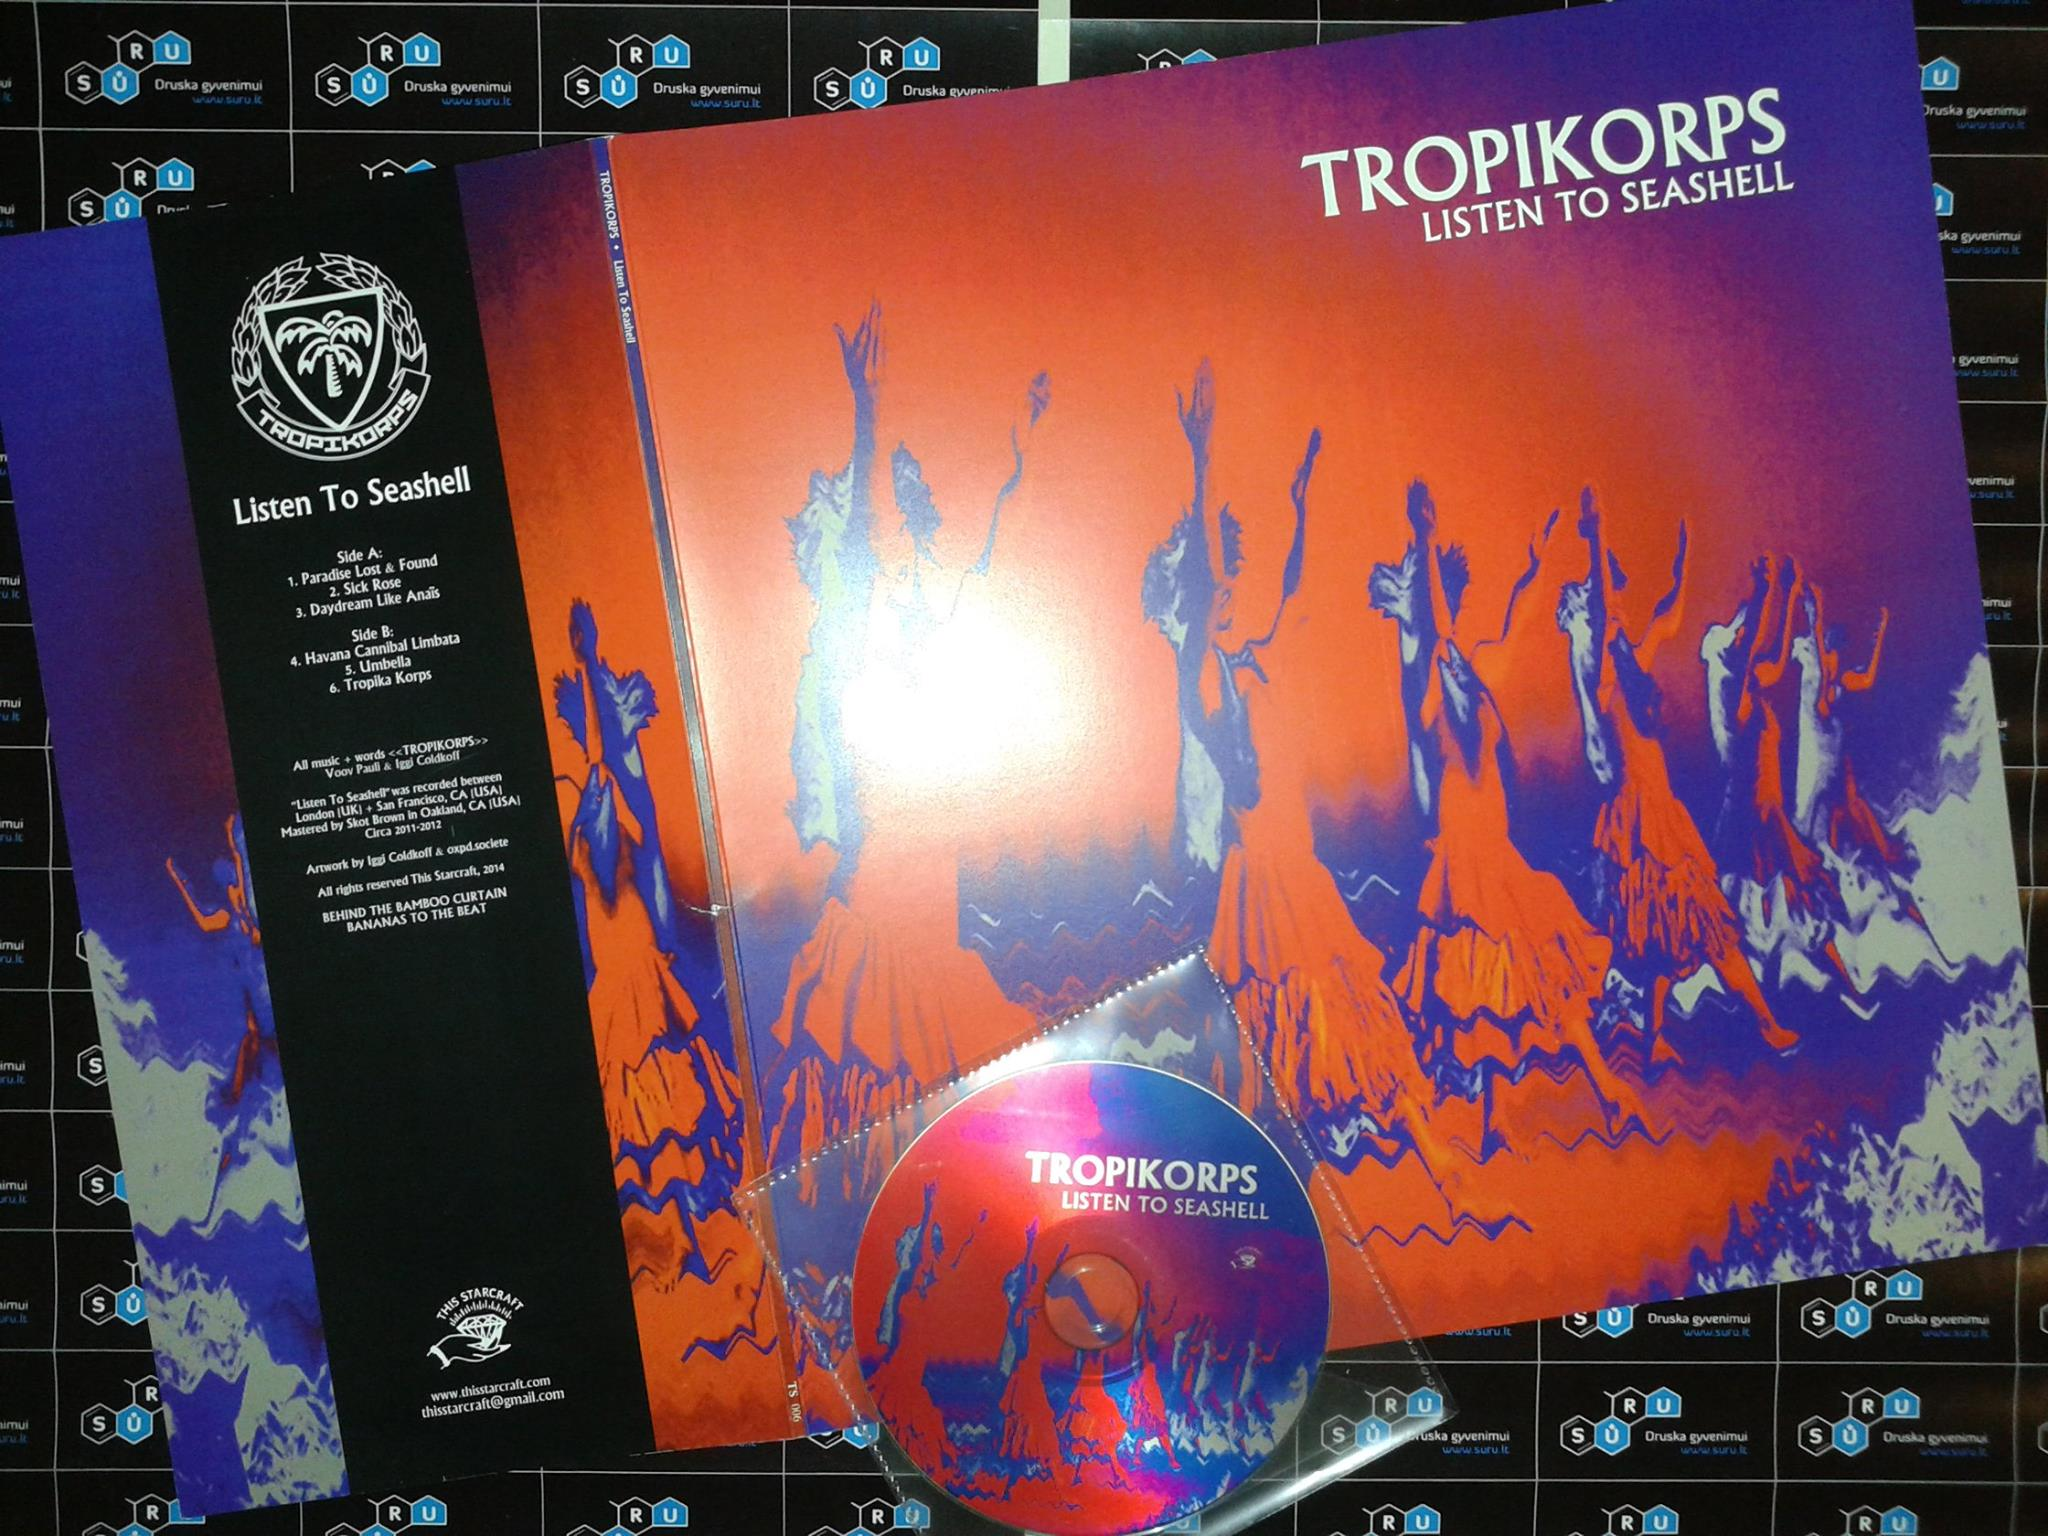 Tropikorps_-_Listen_To_Seashell_promo